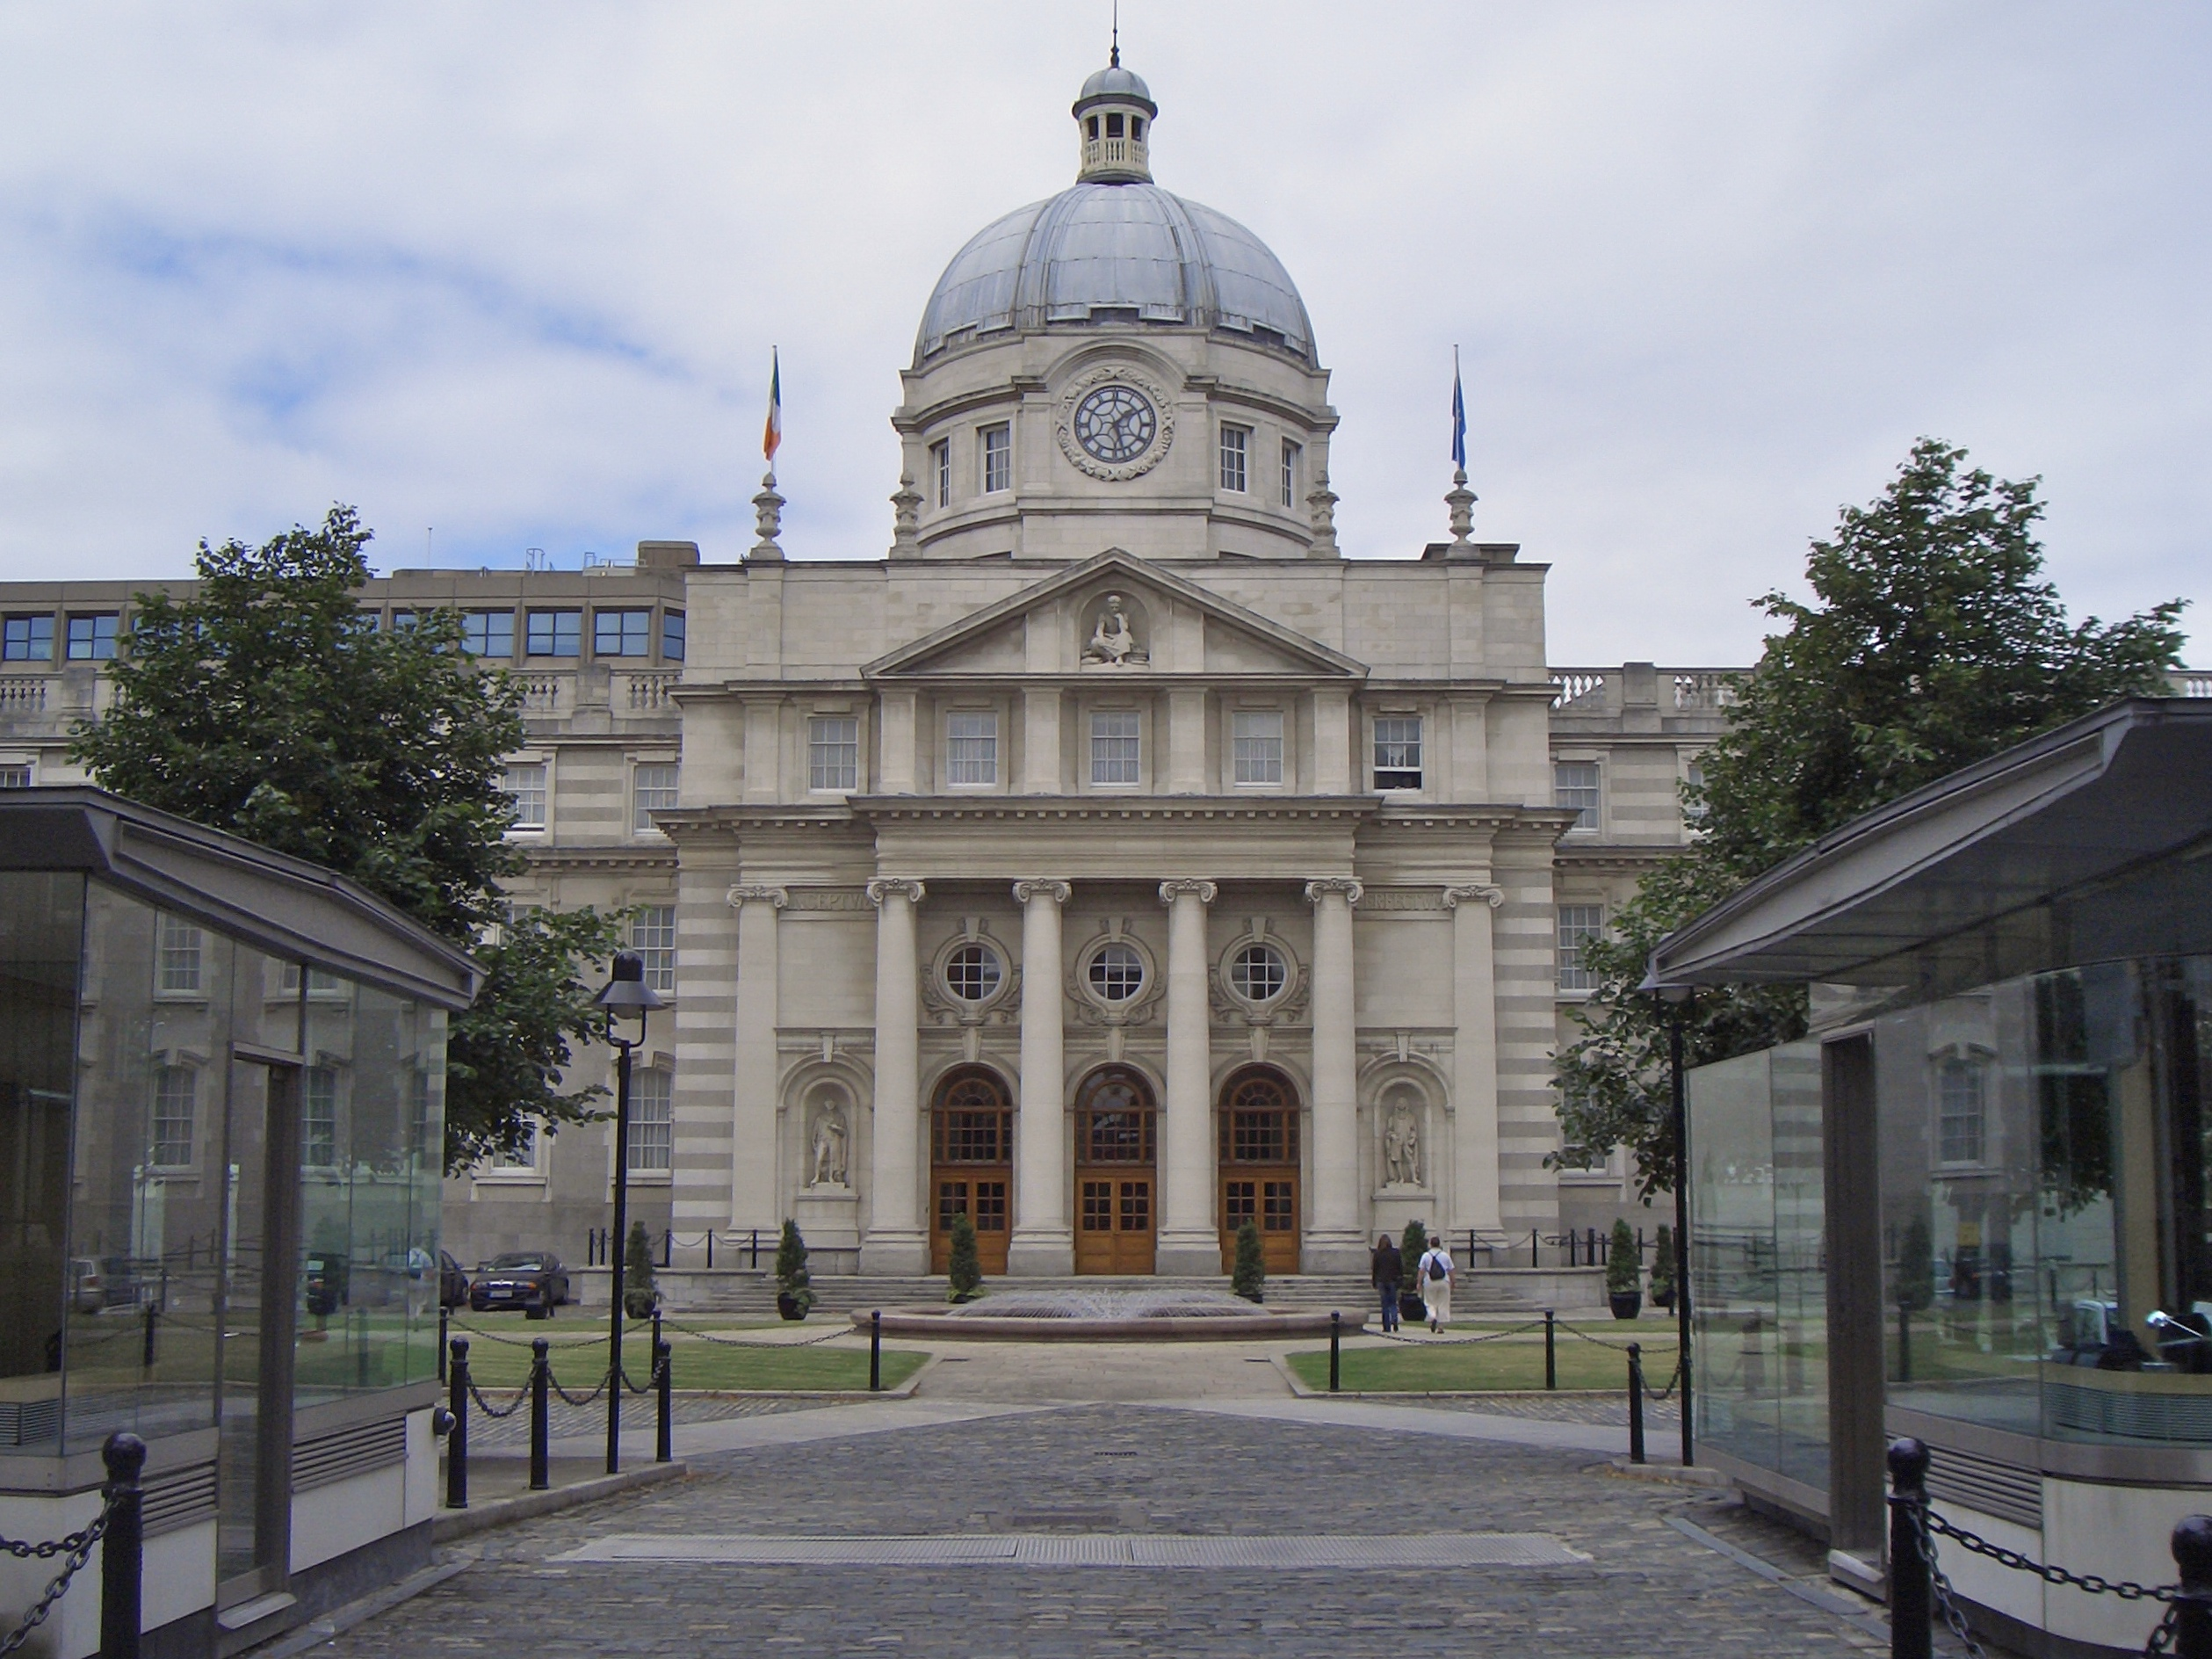 File:Government Buildings, Dublin.jpg - Wikimedia Commons